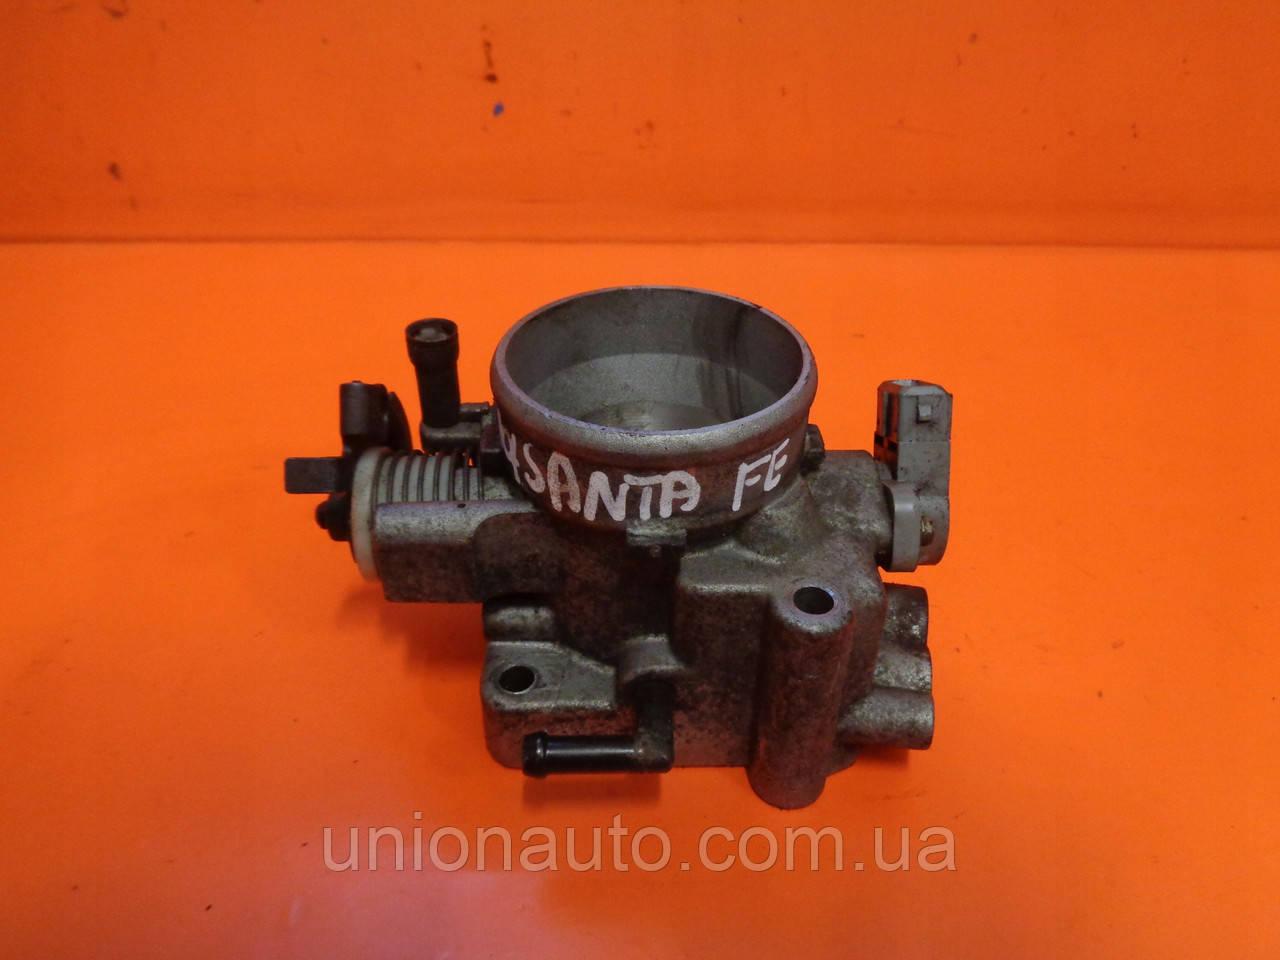 HYUNDAI SANTA FE I 2.7 V6 Дроссельная заслонка 35100-37300